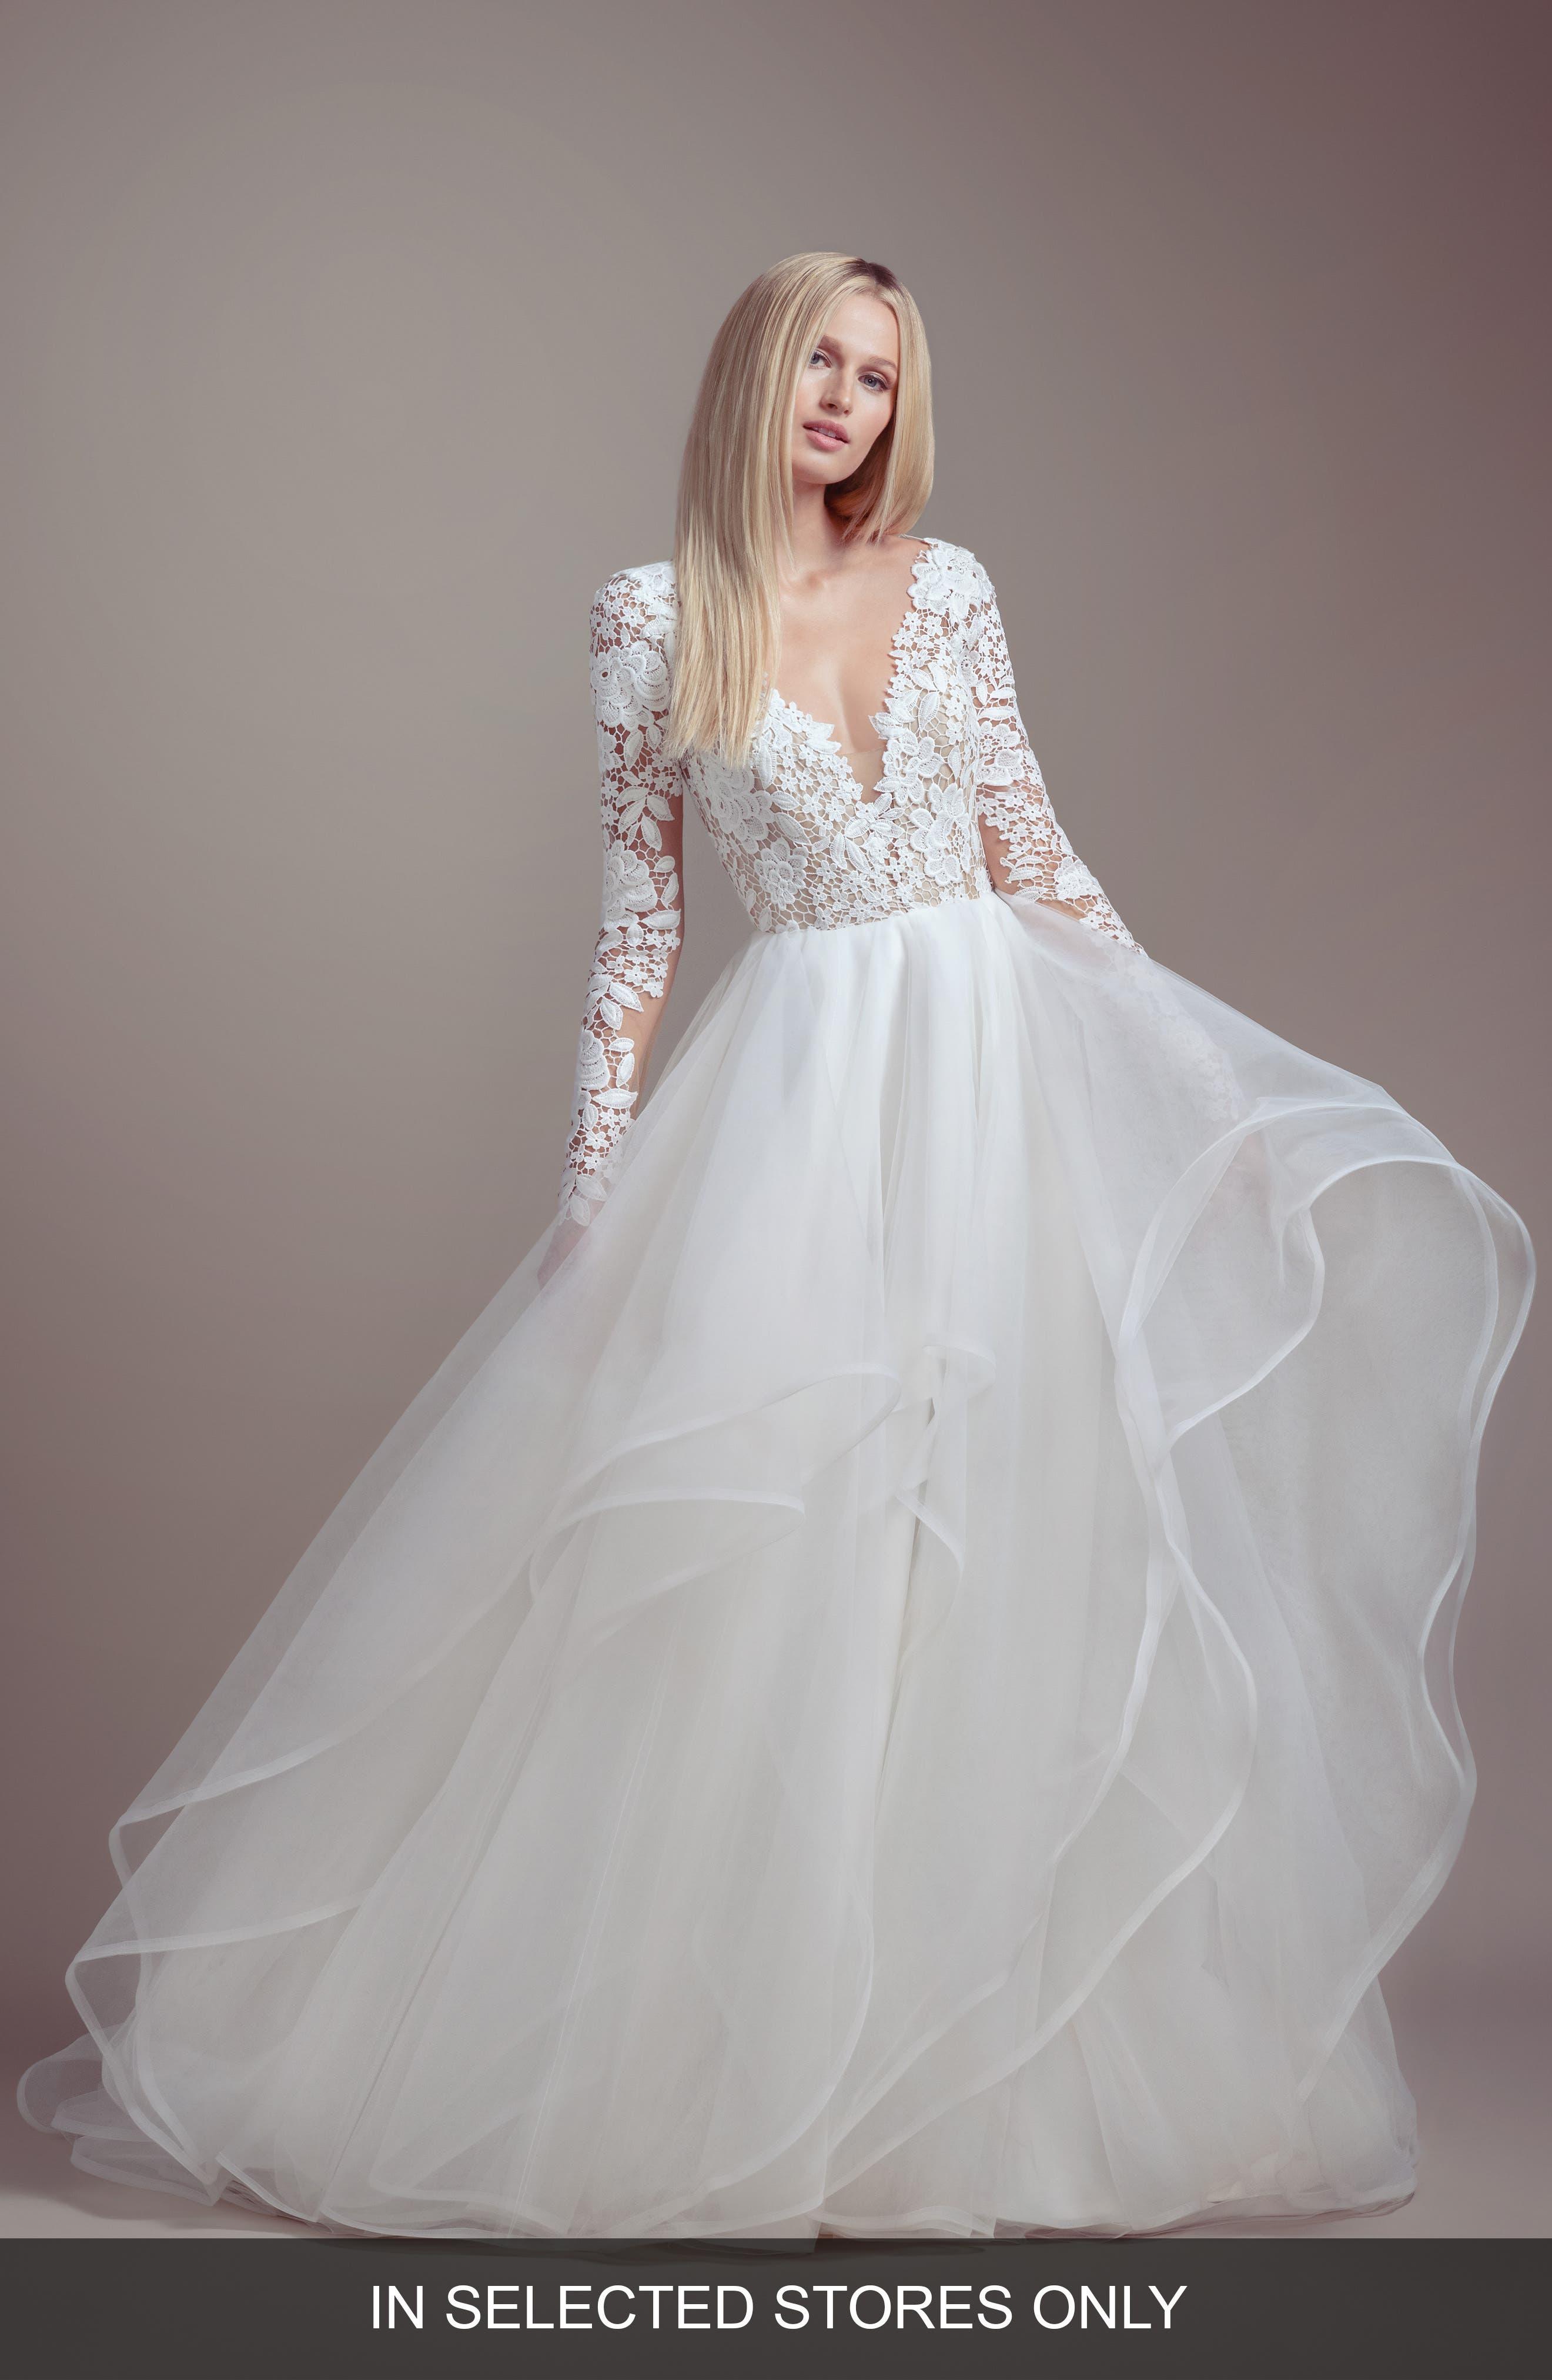 Praise Long Sleeve Lace & Tulle Wedding Dress,                             Main thumbnail 1, color,                             IVORY